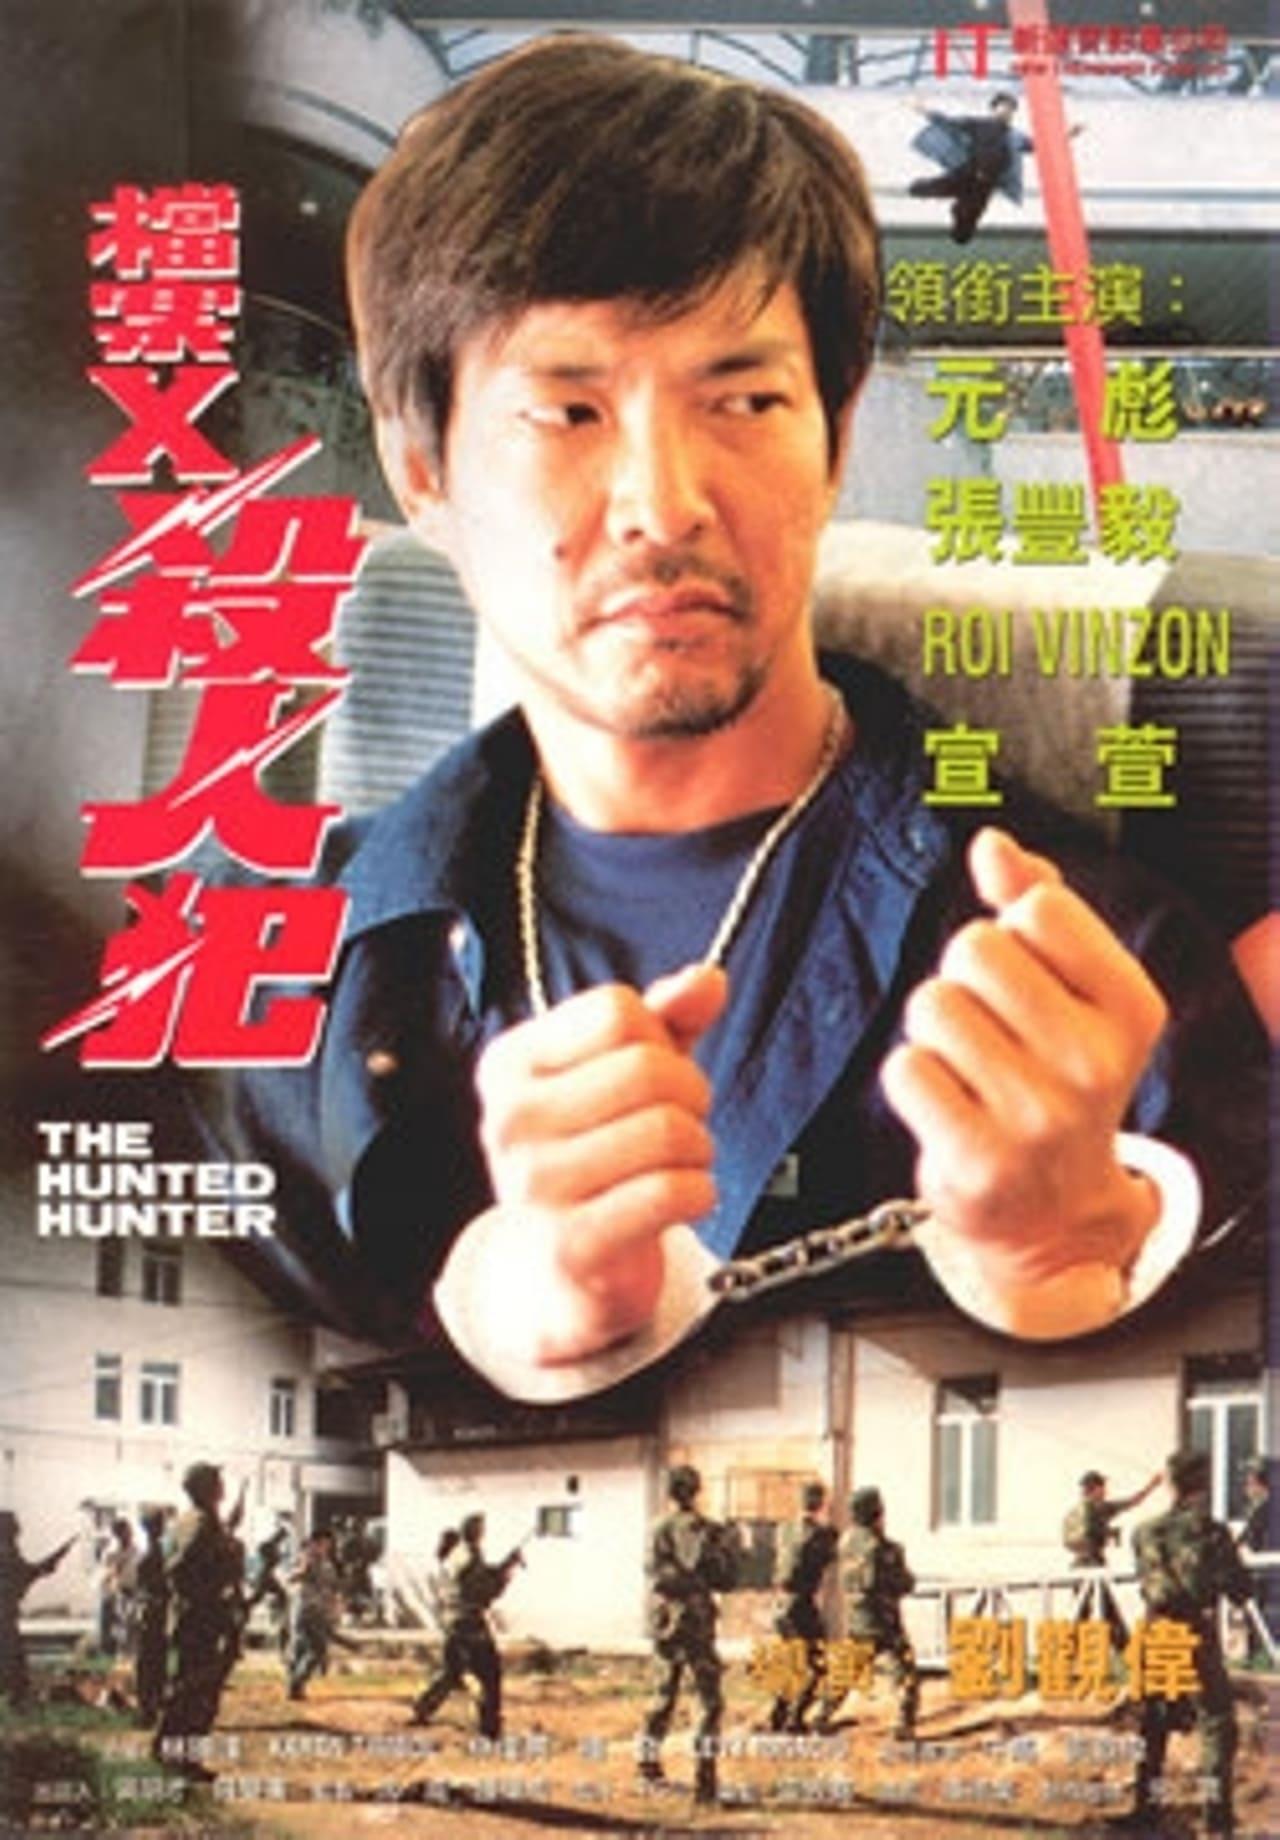 The Hunted Hunter